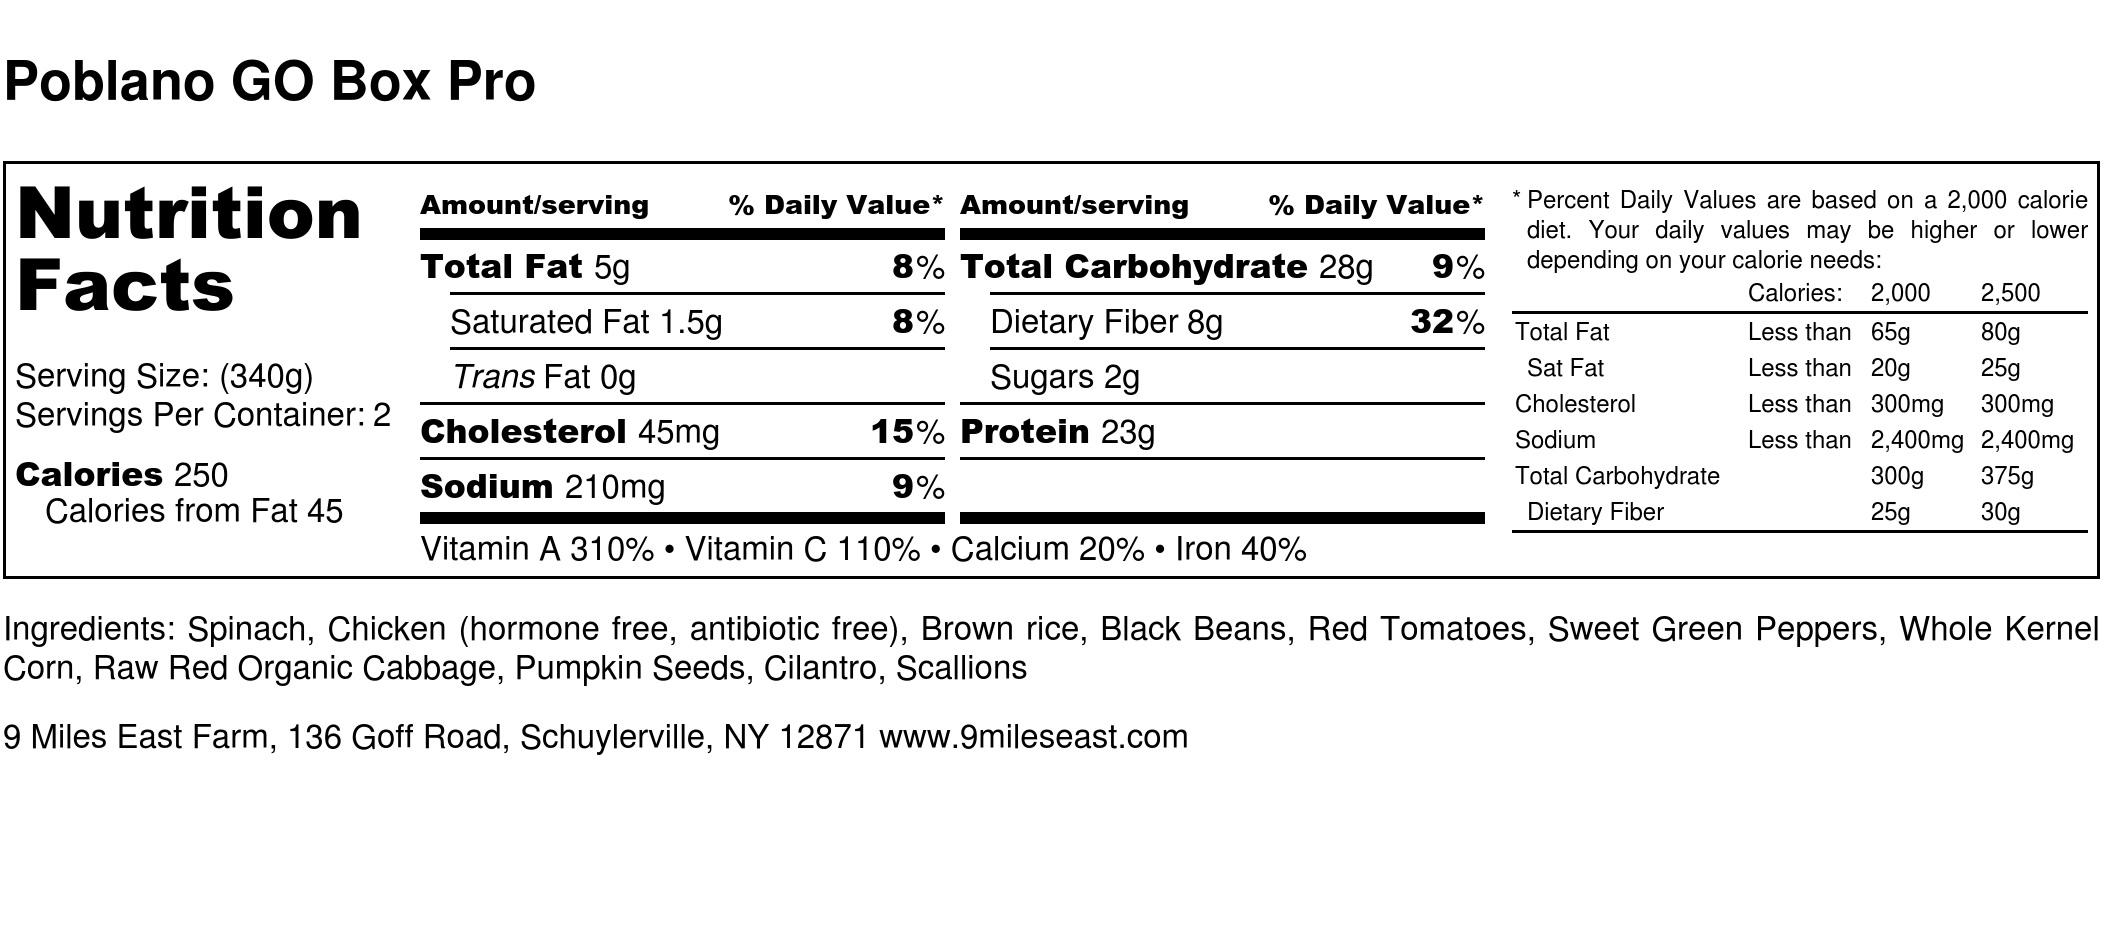 Poblano GO Box Pro - Nutrition Label.jpg